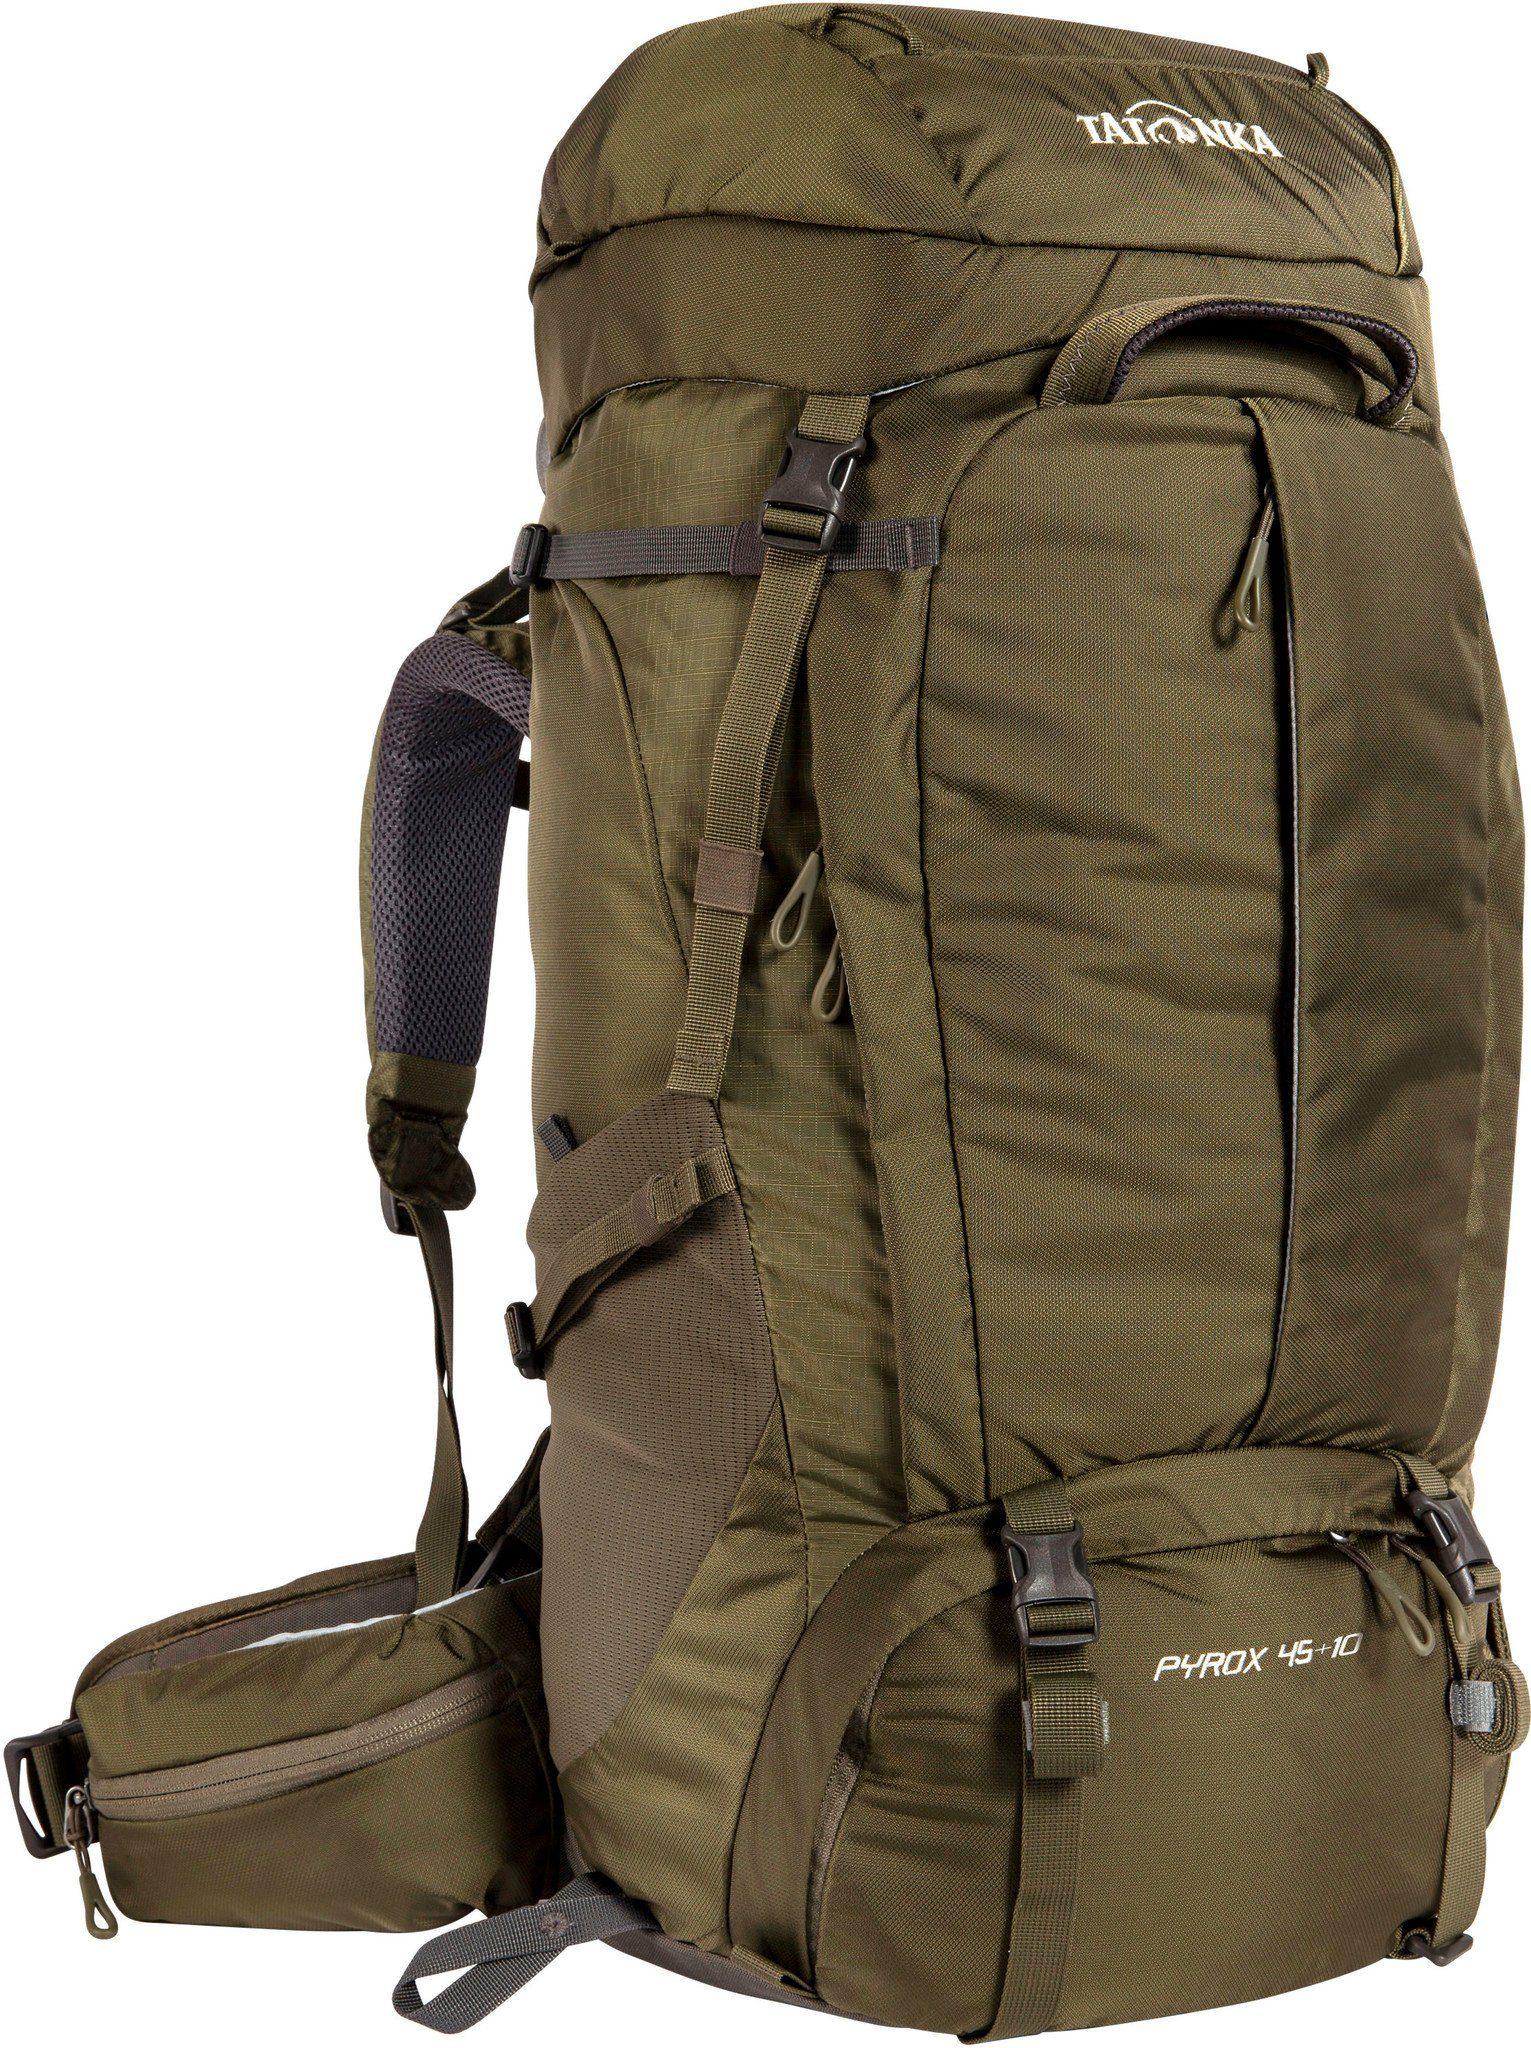 TATONKA® Wanderrucksack »Pyrox 45+10 Backpack«